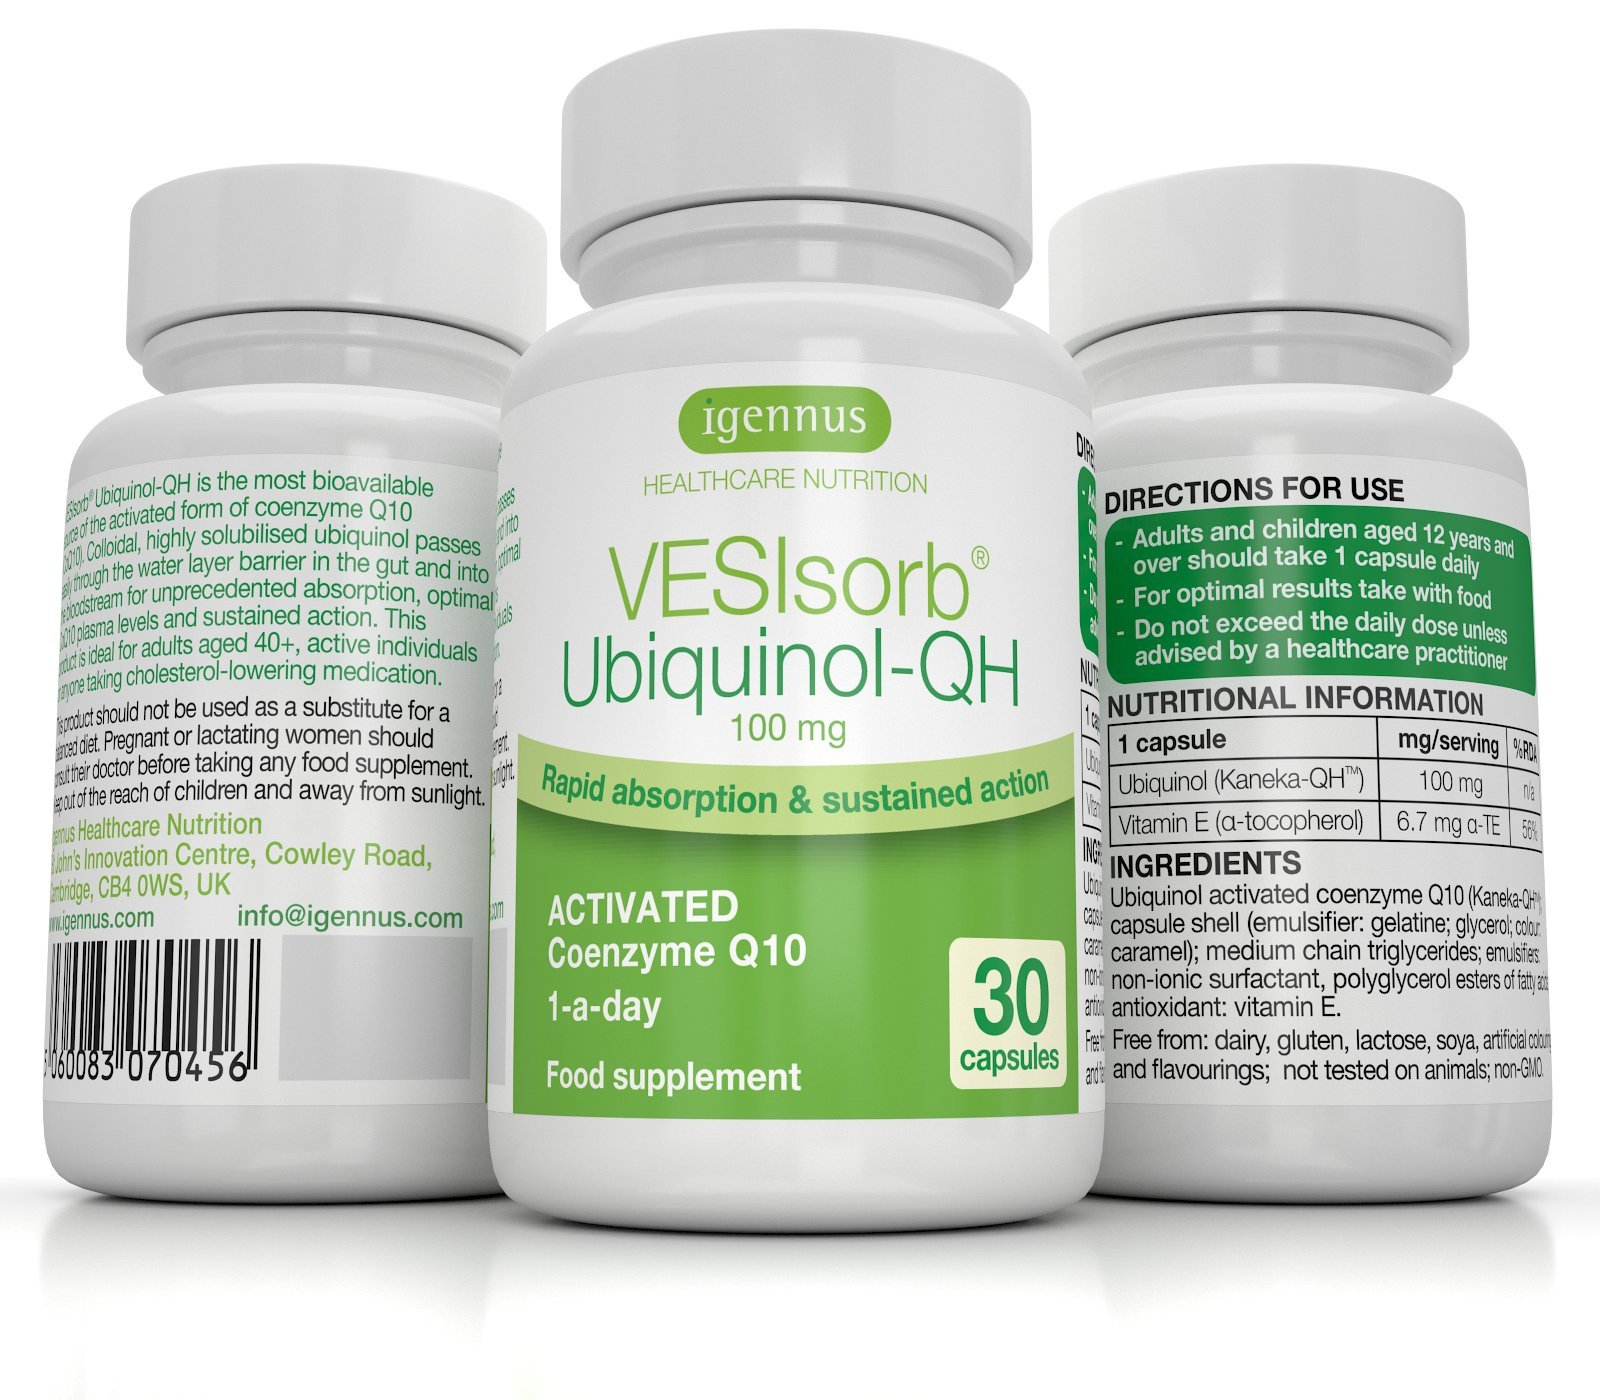 81kA1SbZMmL - VESIsorb Ubiquinol-QH Advanced Fast-Acting Coenzyme Q10-100 mg Water-Soluble Kaneka QH Ubiquinol CoQ10 Supplement Ideal…